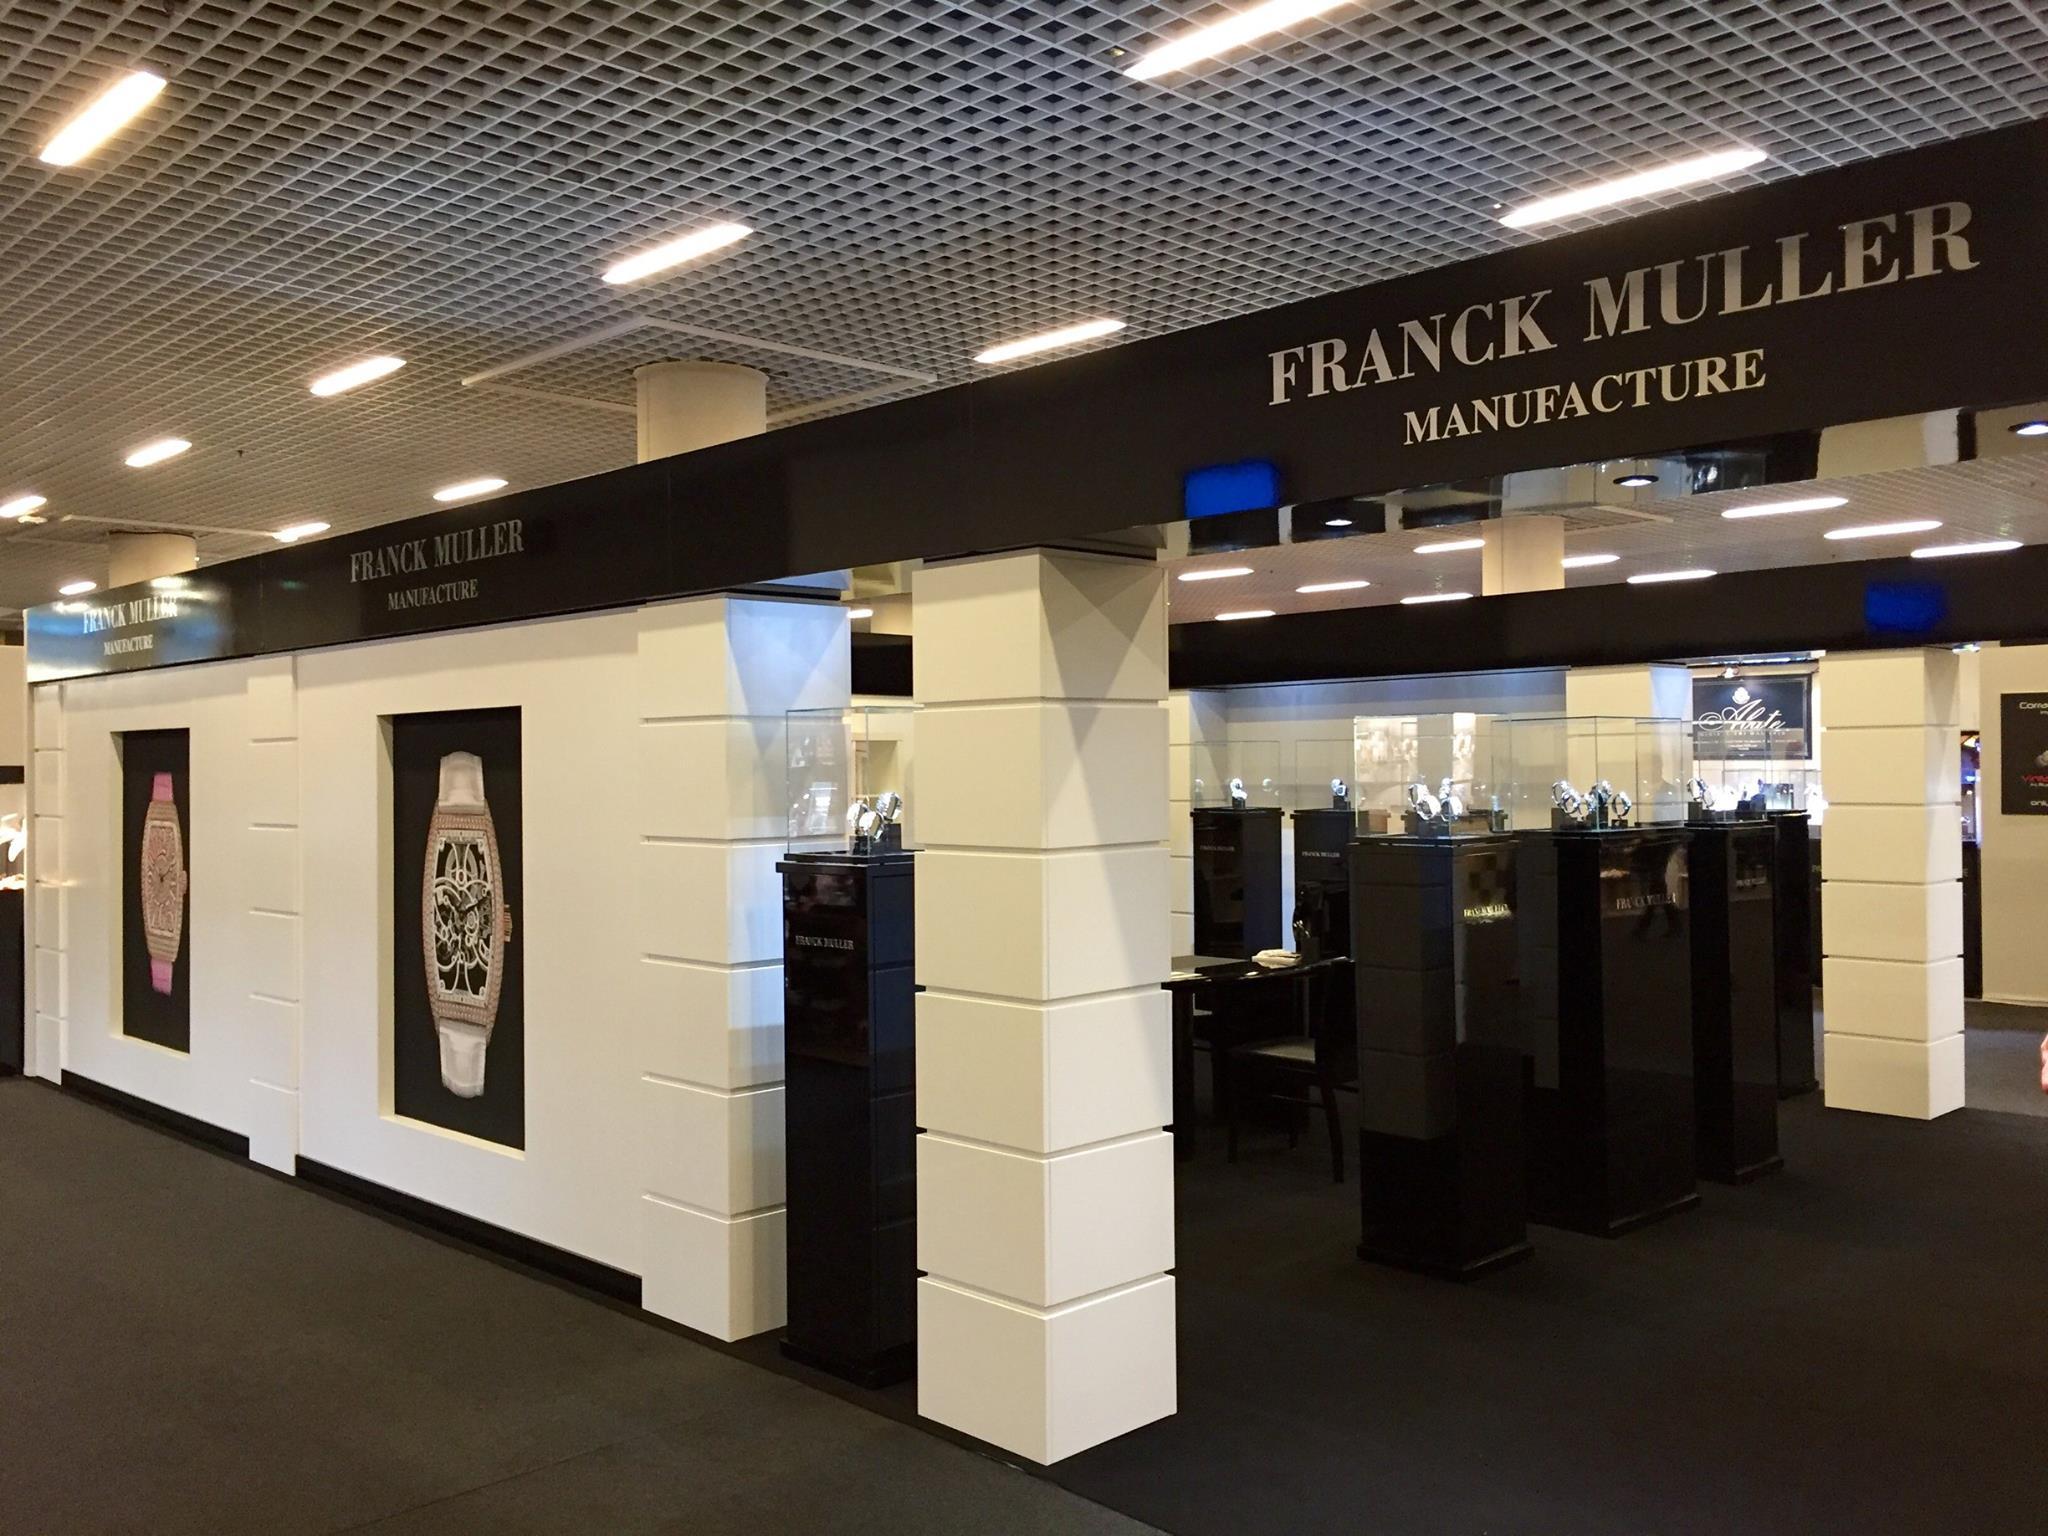 Top Marques Monaco Franck Muller Watchland.jpg